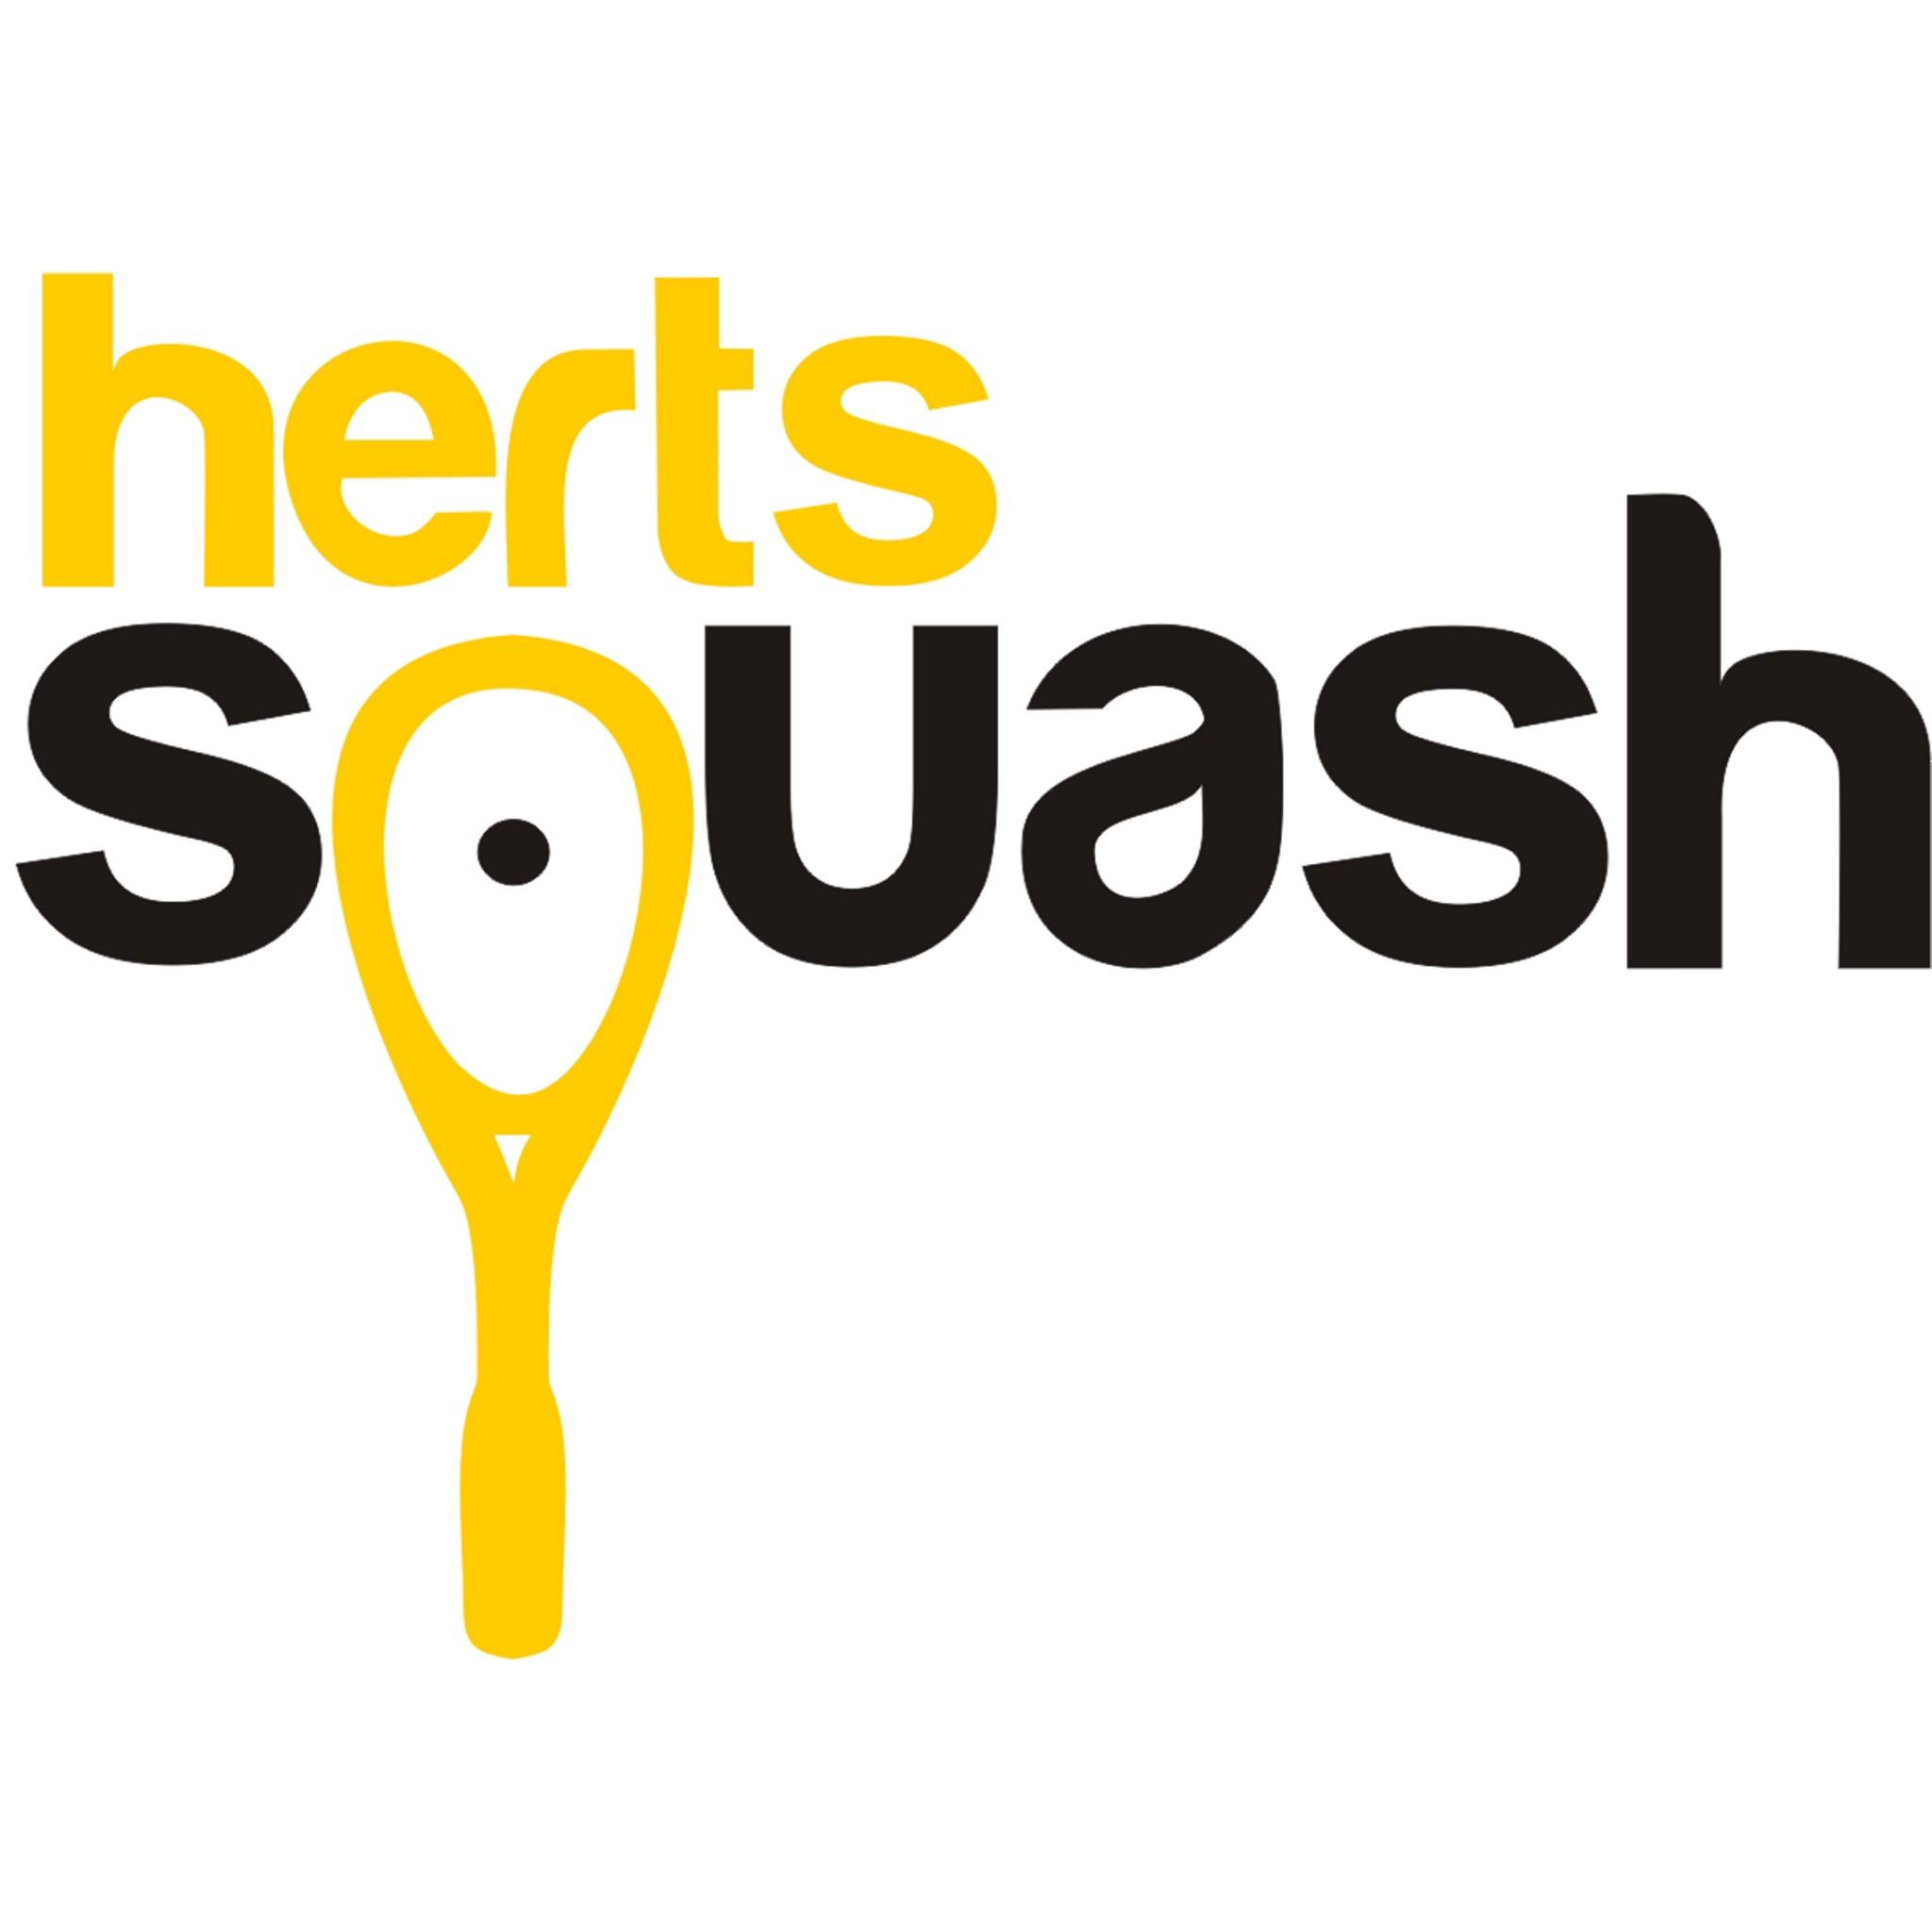 Herts Squash